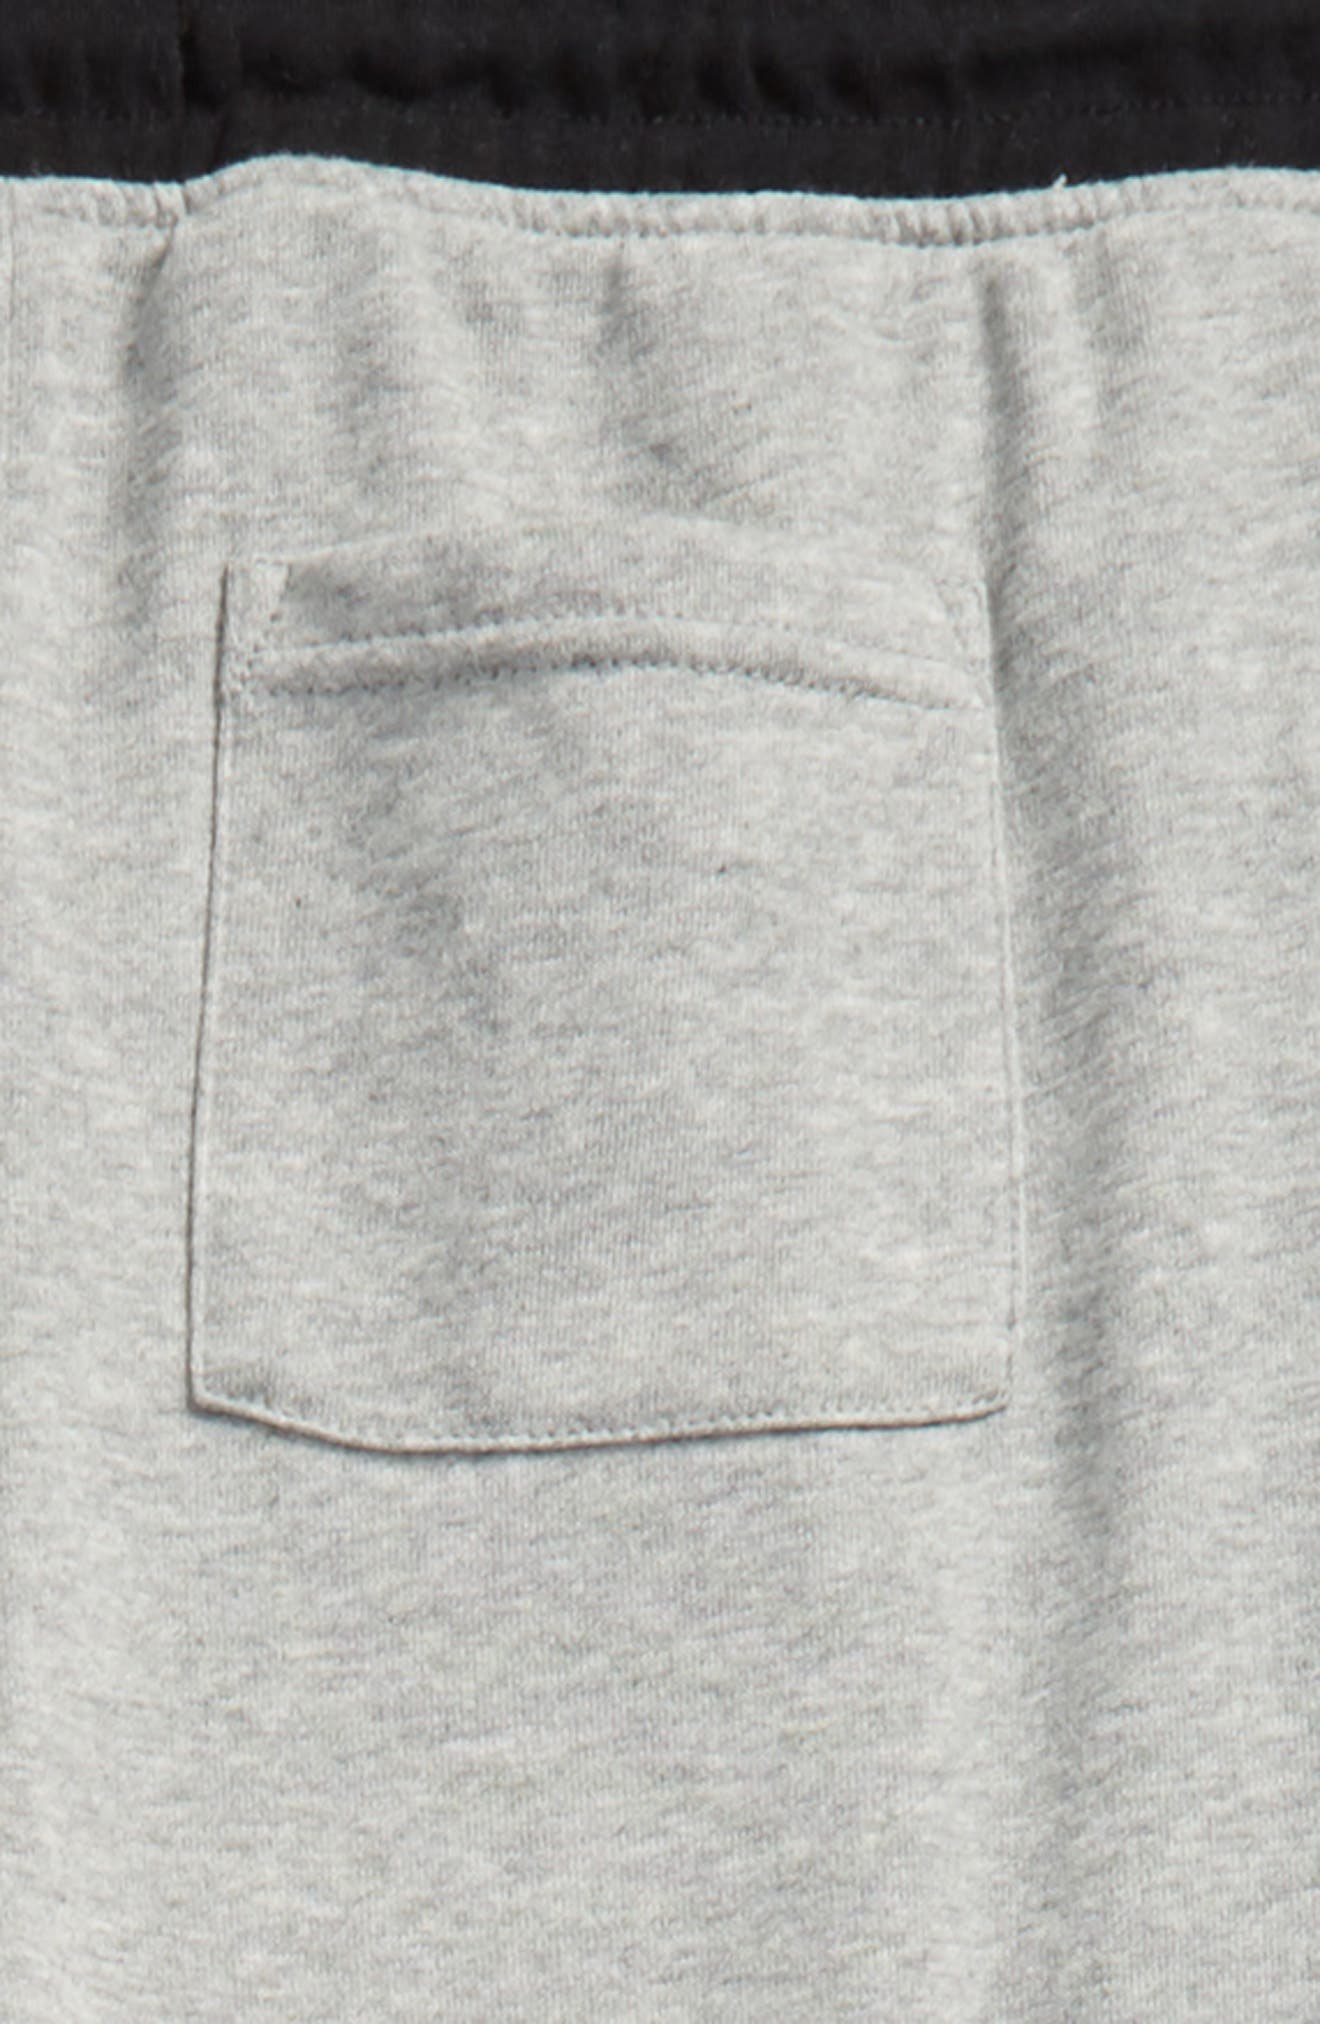 Jogger Pants,                             Alternate thumbnail 3, color,                             Heather Grey/ Black